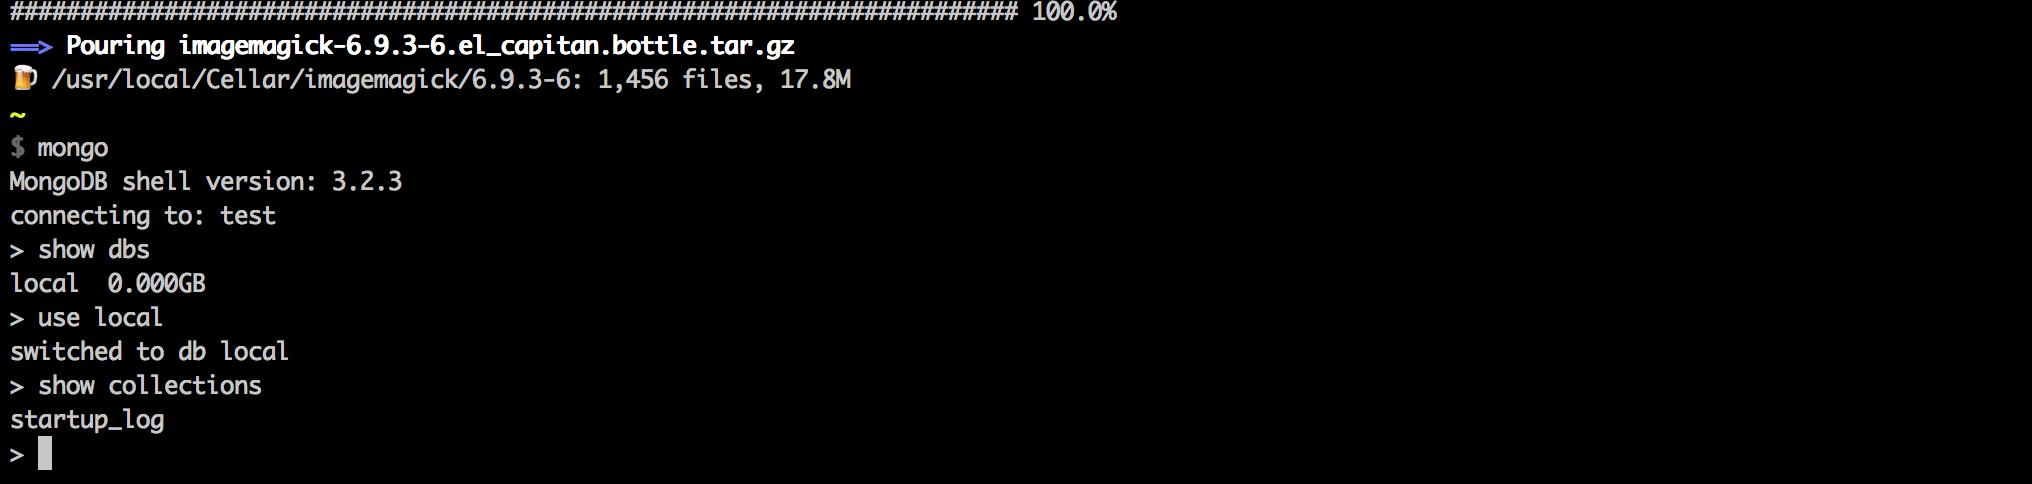 Install Node + NPM + MongoDB on a Mac